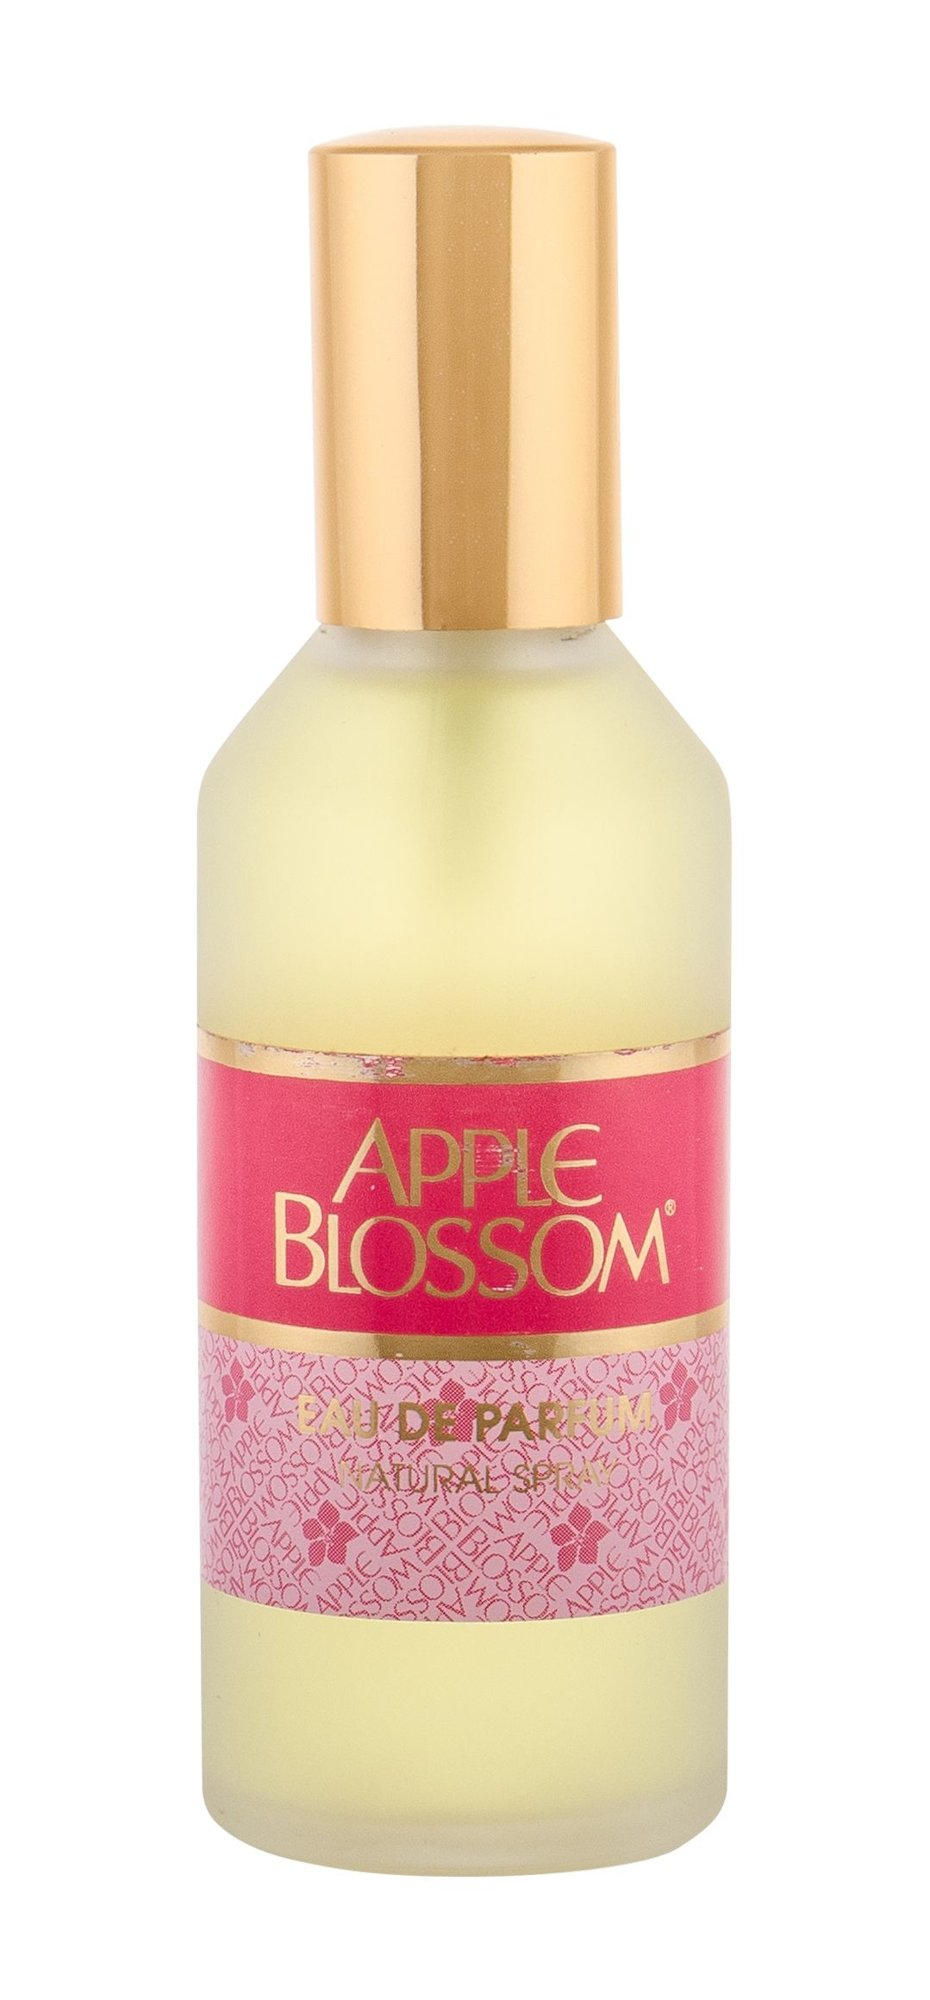 Kent Cosmetics Limited Apple Blossom Eau de Parfum 60ml